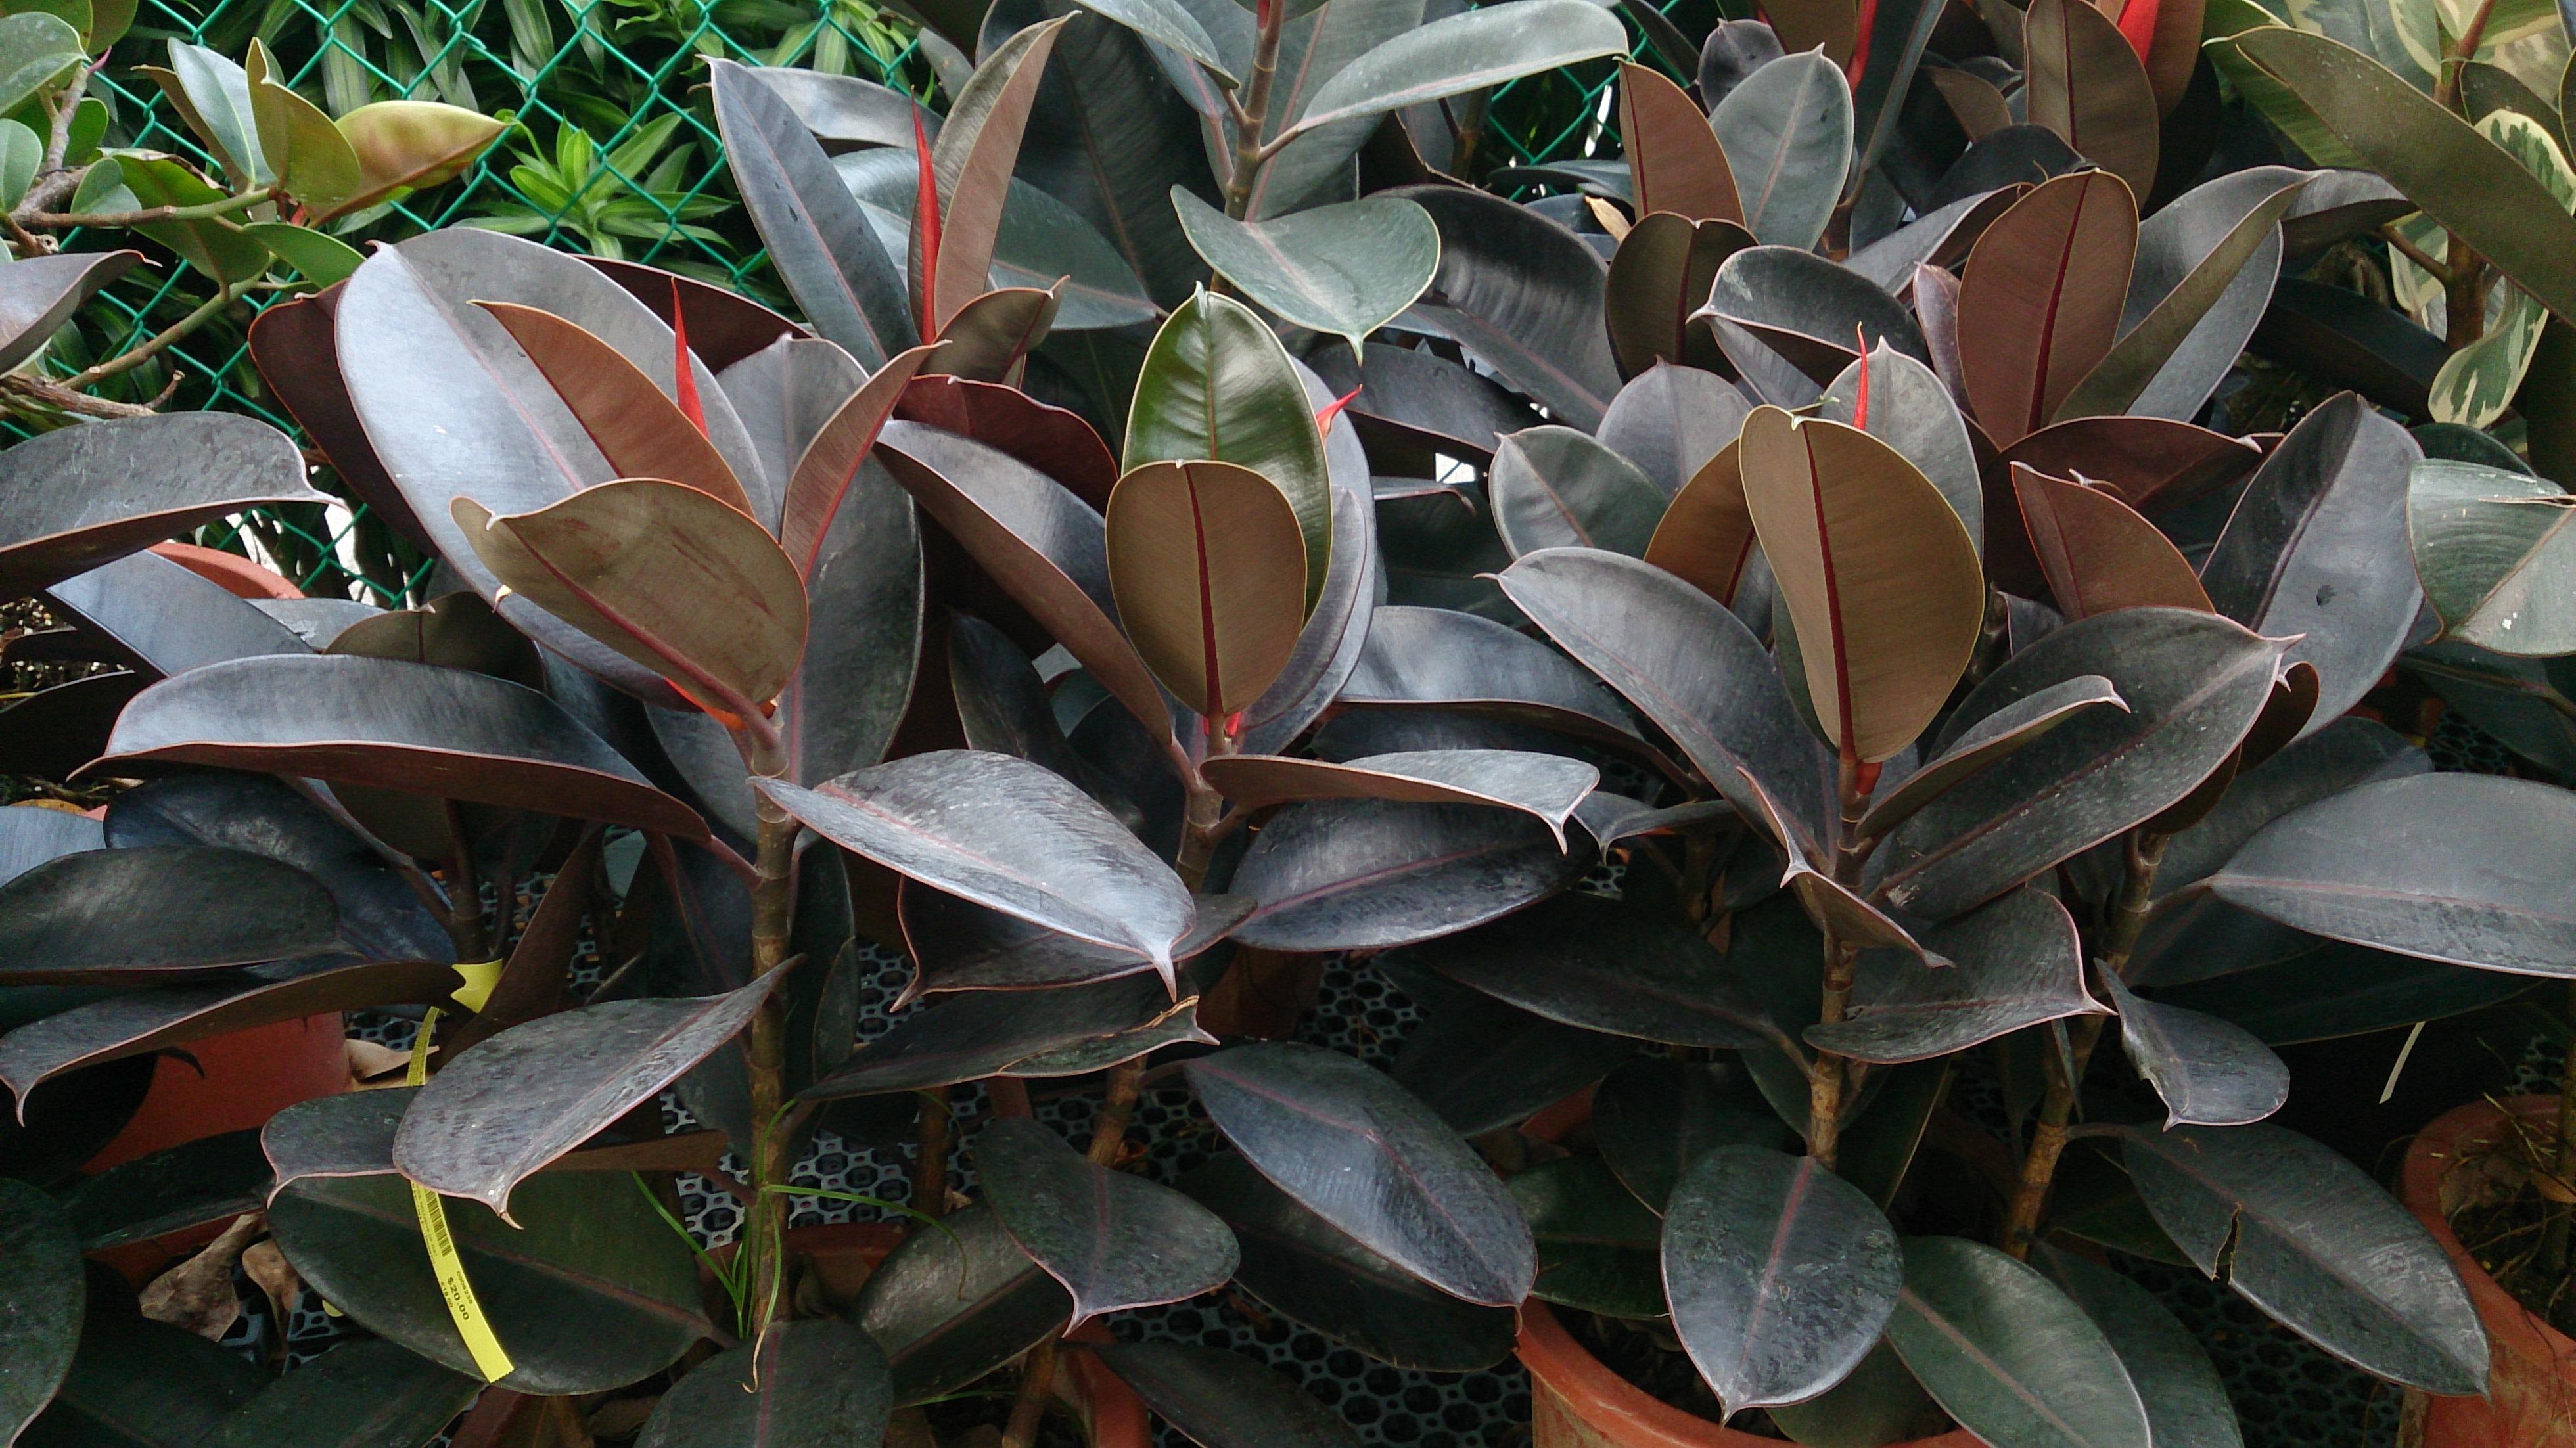 File:Rubber Plant (Ficus elastica 'Robusta') 1.jpg - Wikimedia Commons